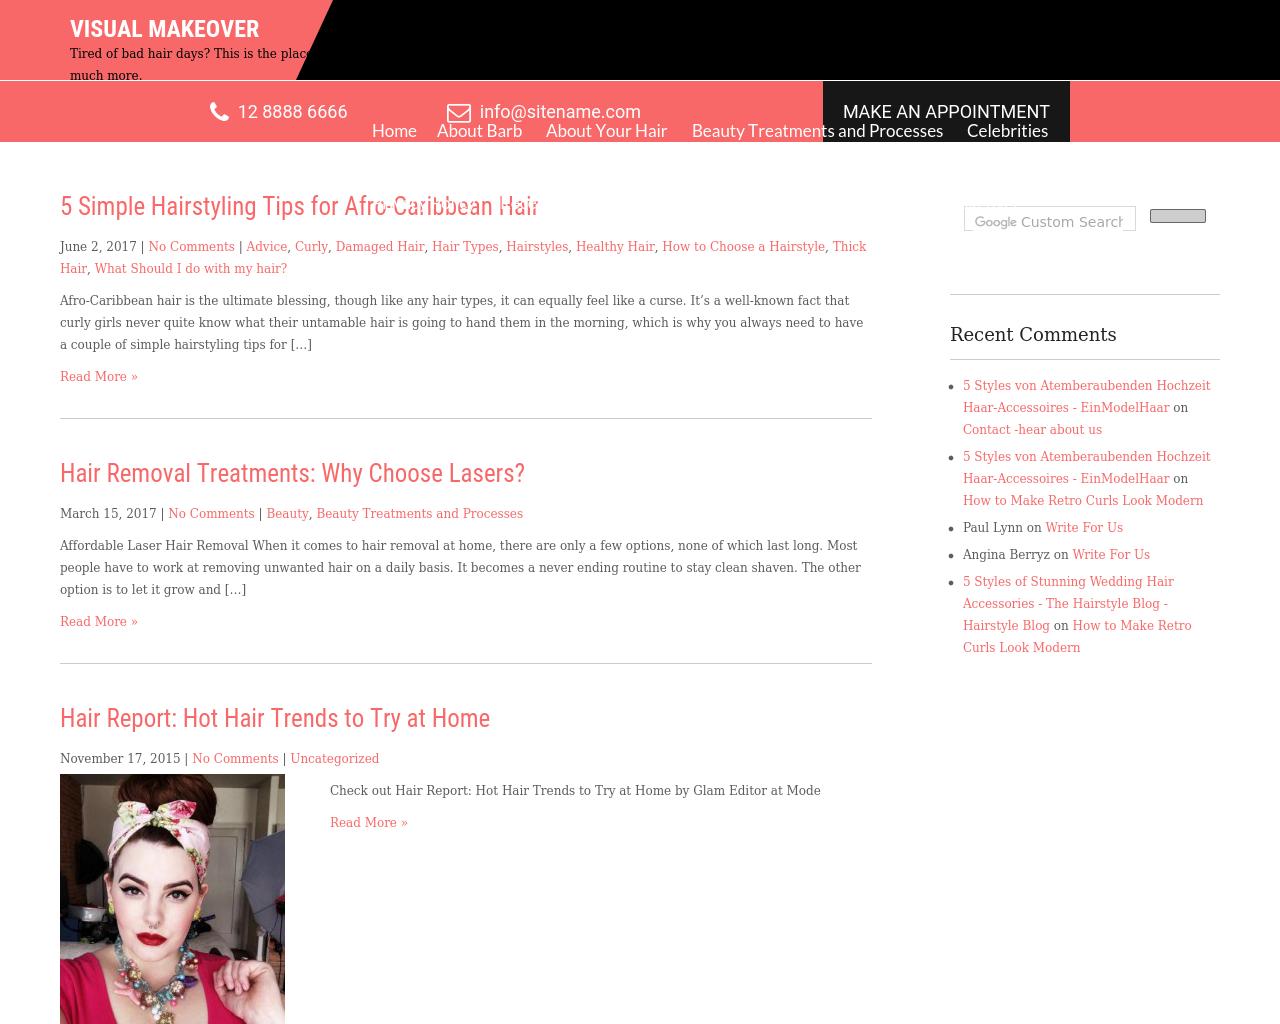 Visual-Makeover-Advertising-Reviews-Pricing